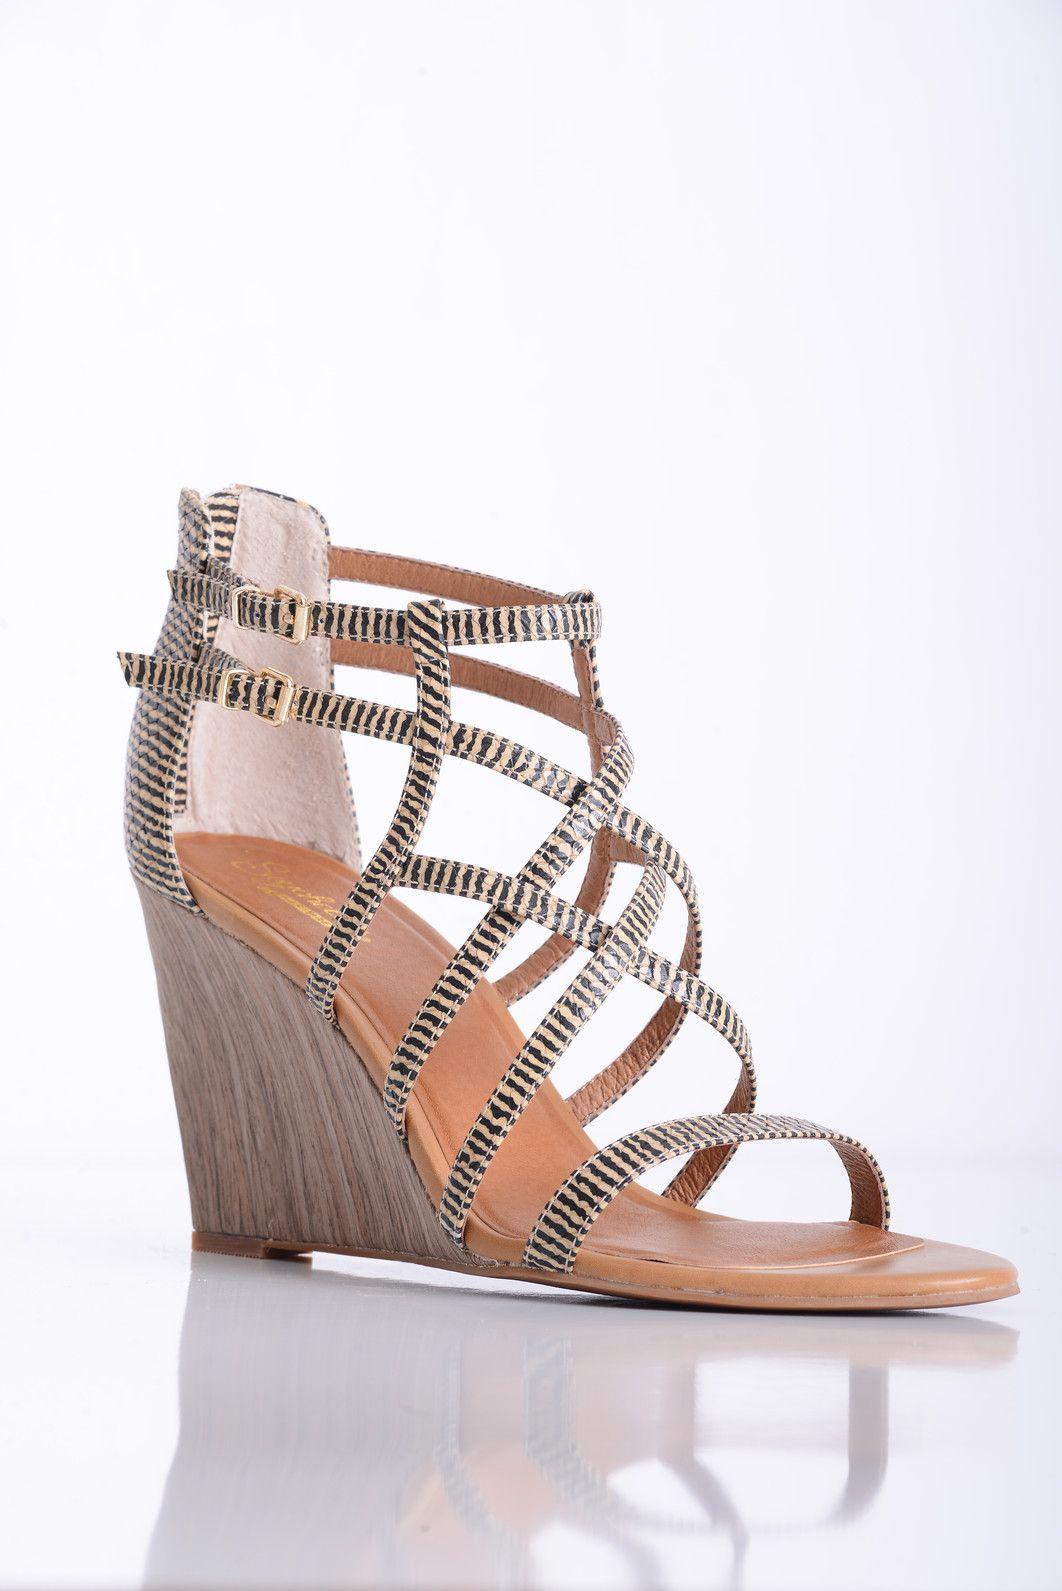 0da1ae6df8d Seychelles Illustrious Strappy Wedge Wooden Heels